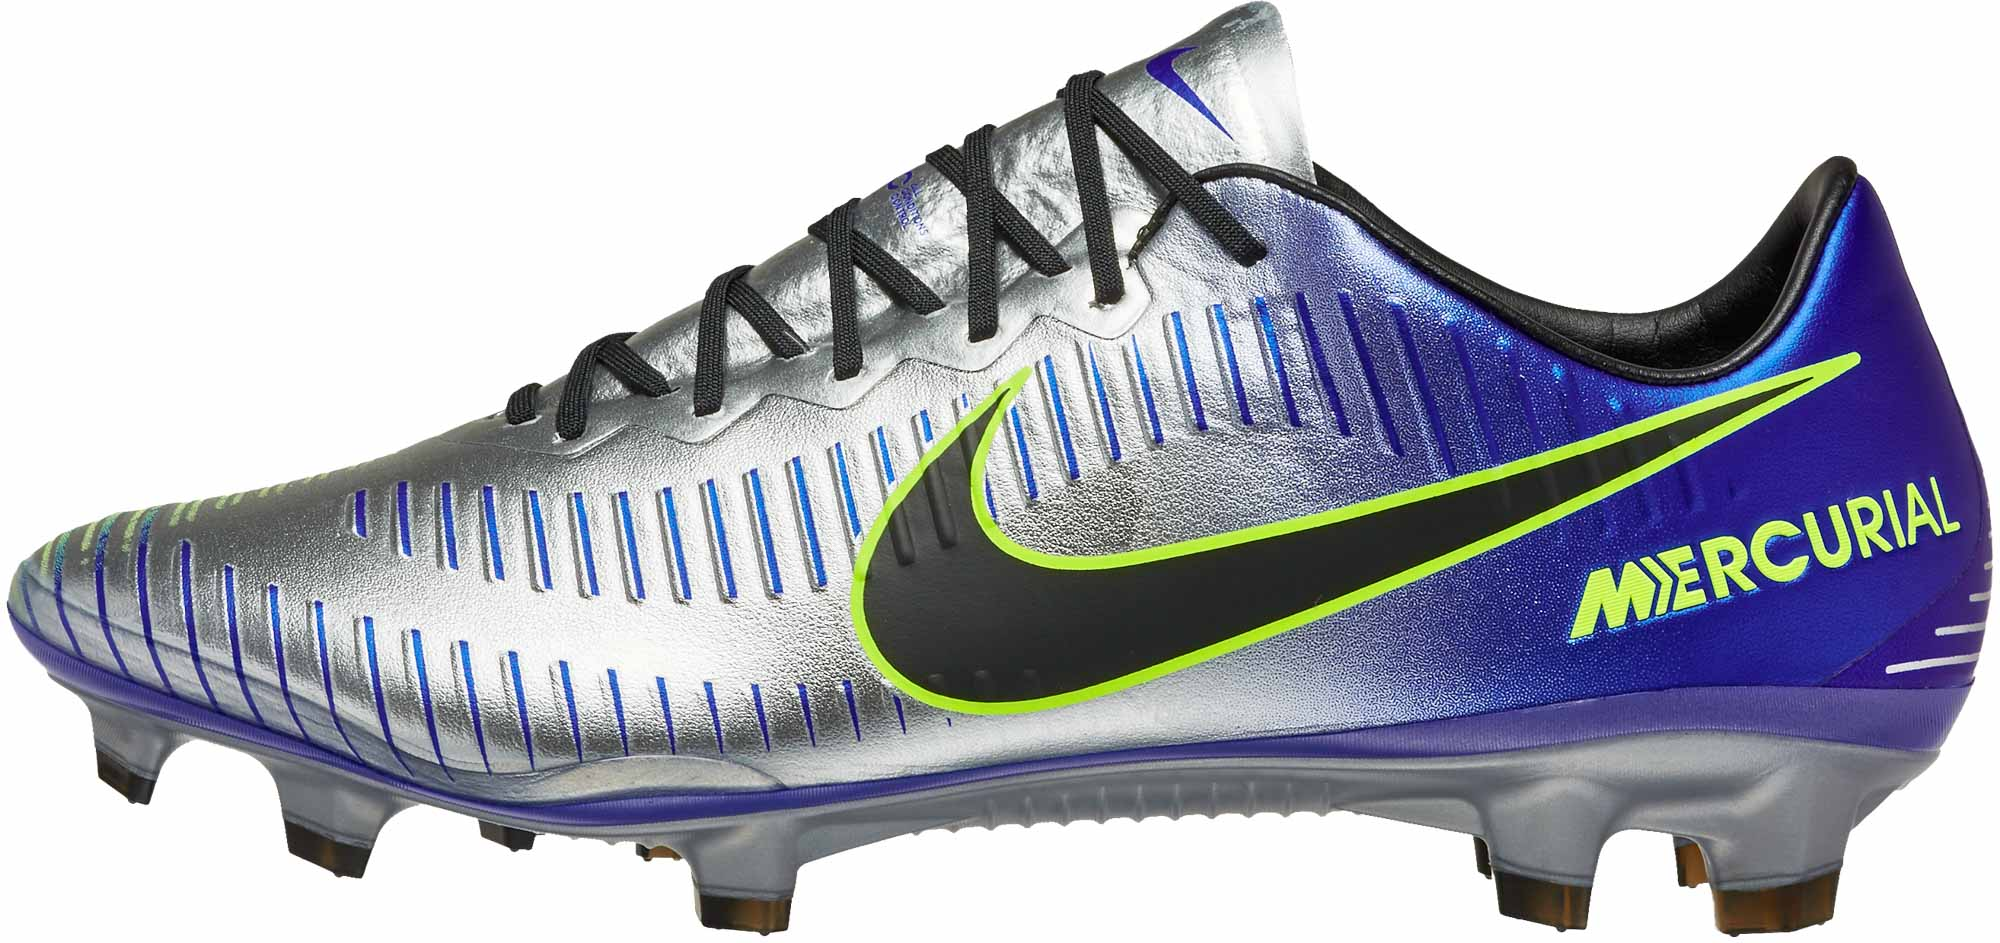 2838d512d32 Nike Mercurial Vapor XI FG - Neymar Jr - Racer Blue   Chrome